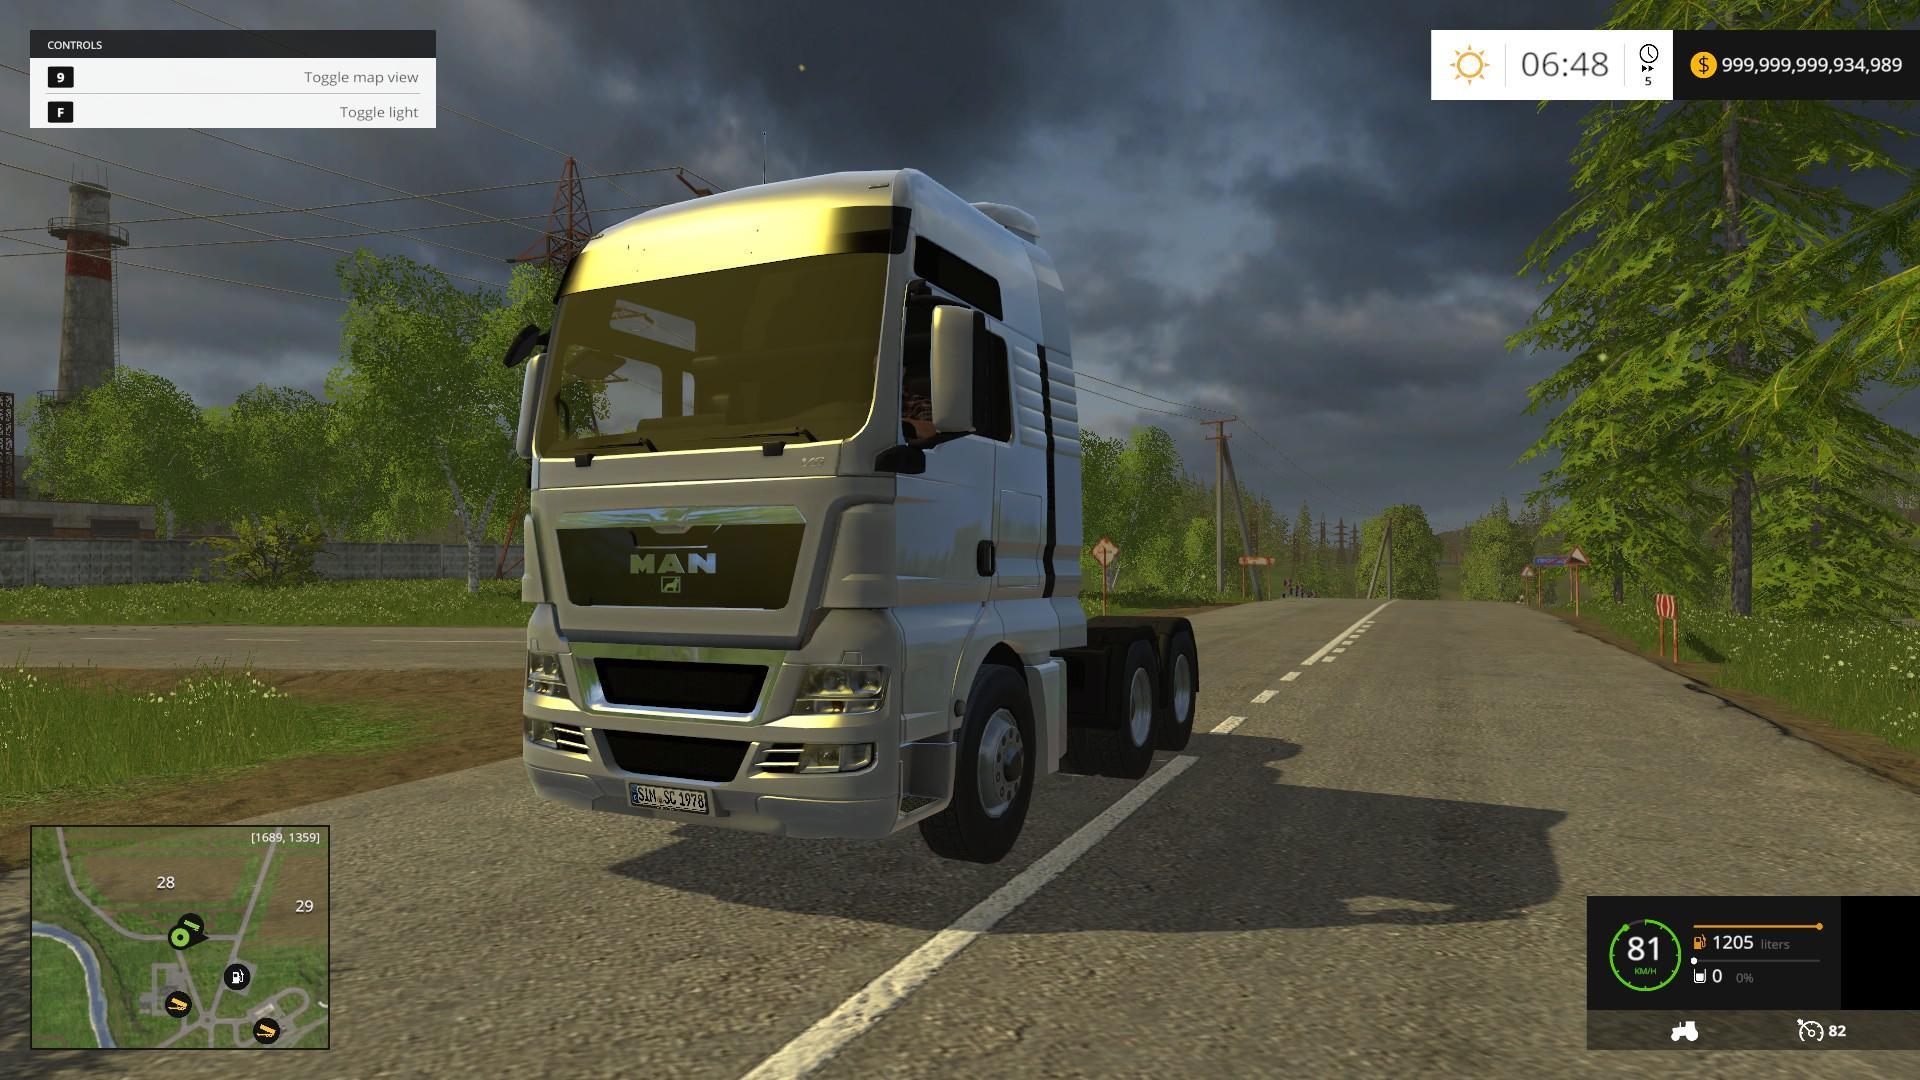 man tgx truck v1 0 farming simulator 2019 2017 2015 mod. Black Bedroom Furniture Sets. Home Design Ideas